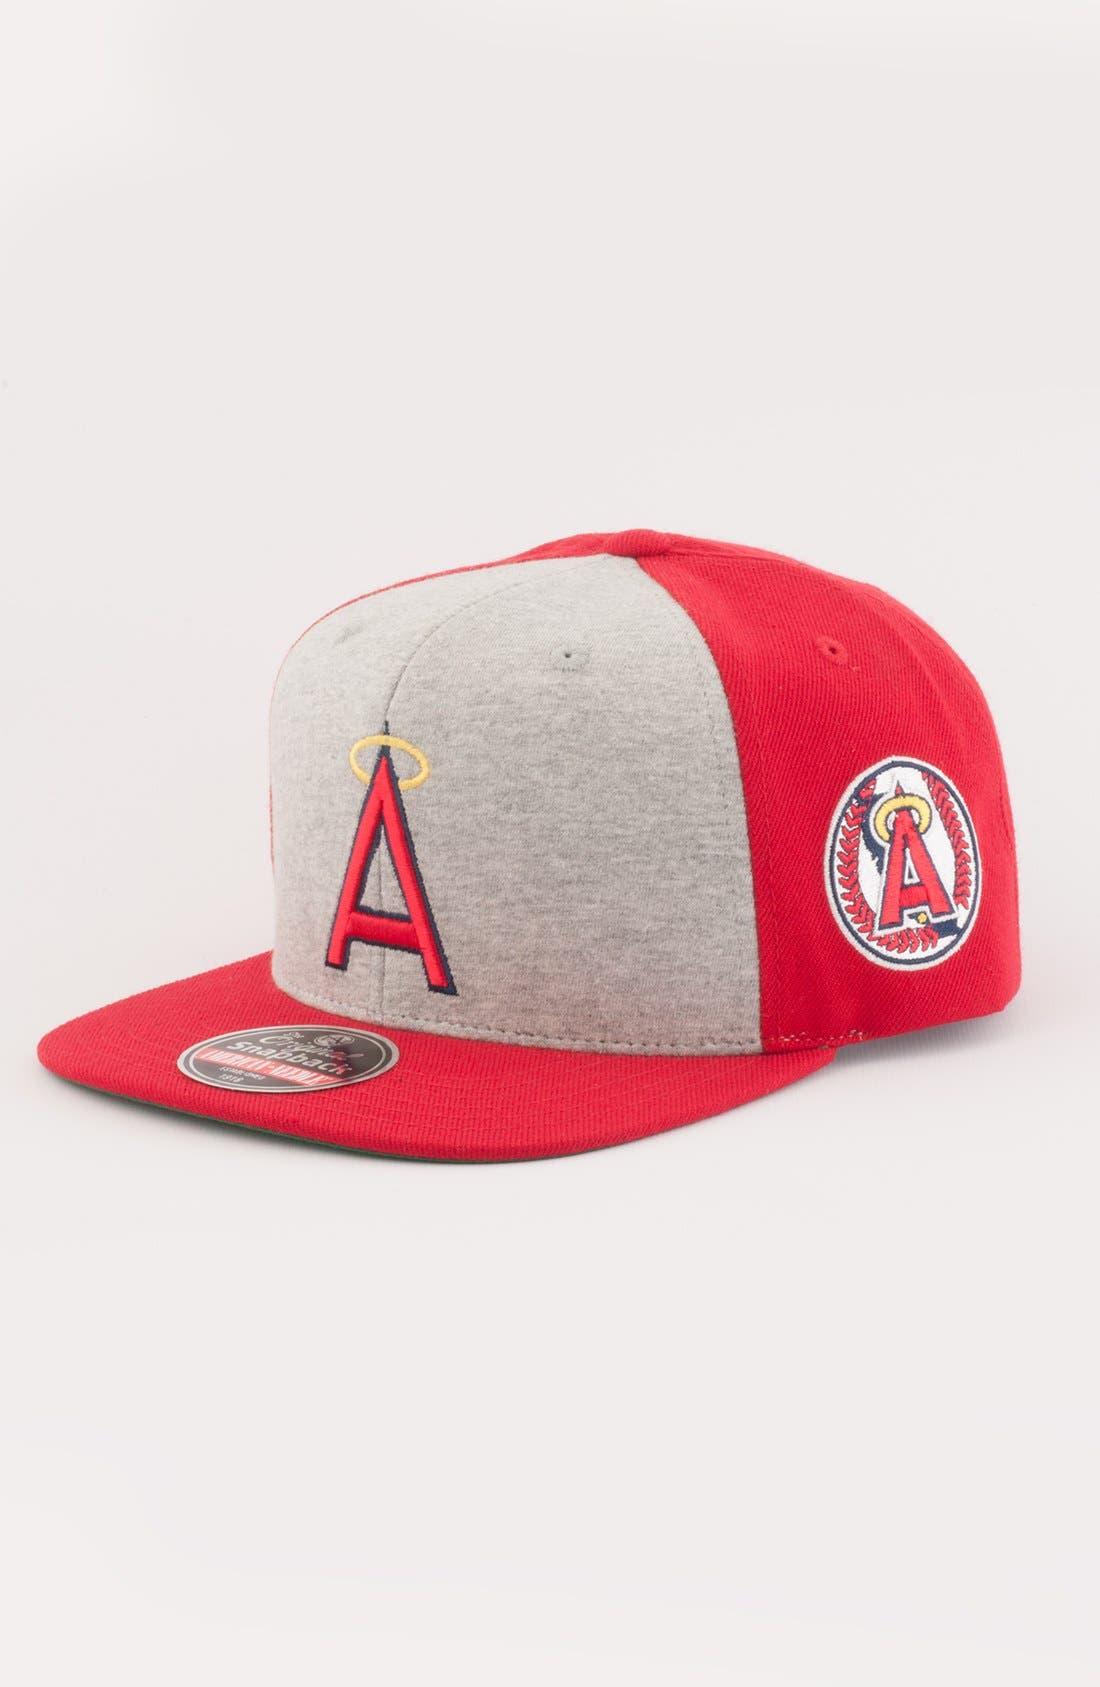 Main Image - American Needle 'Anaheim Angels - Jimbo' Snapback Baseball Cap